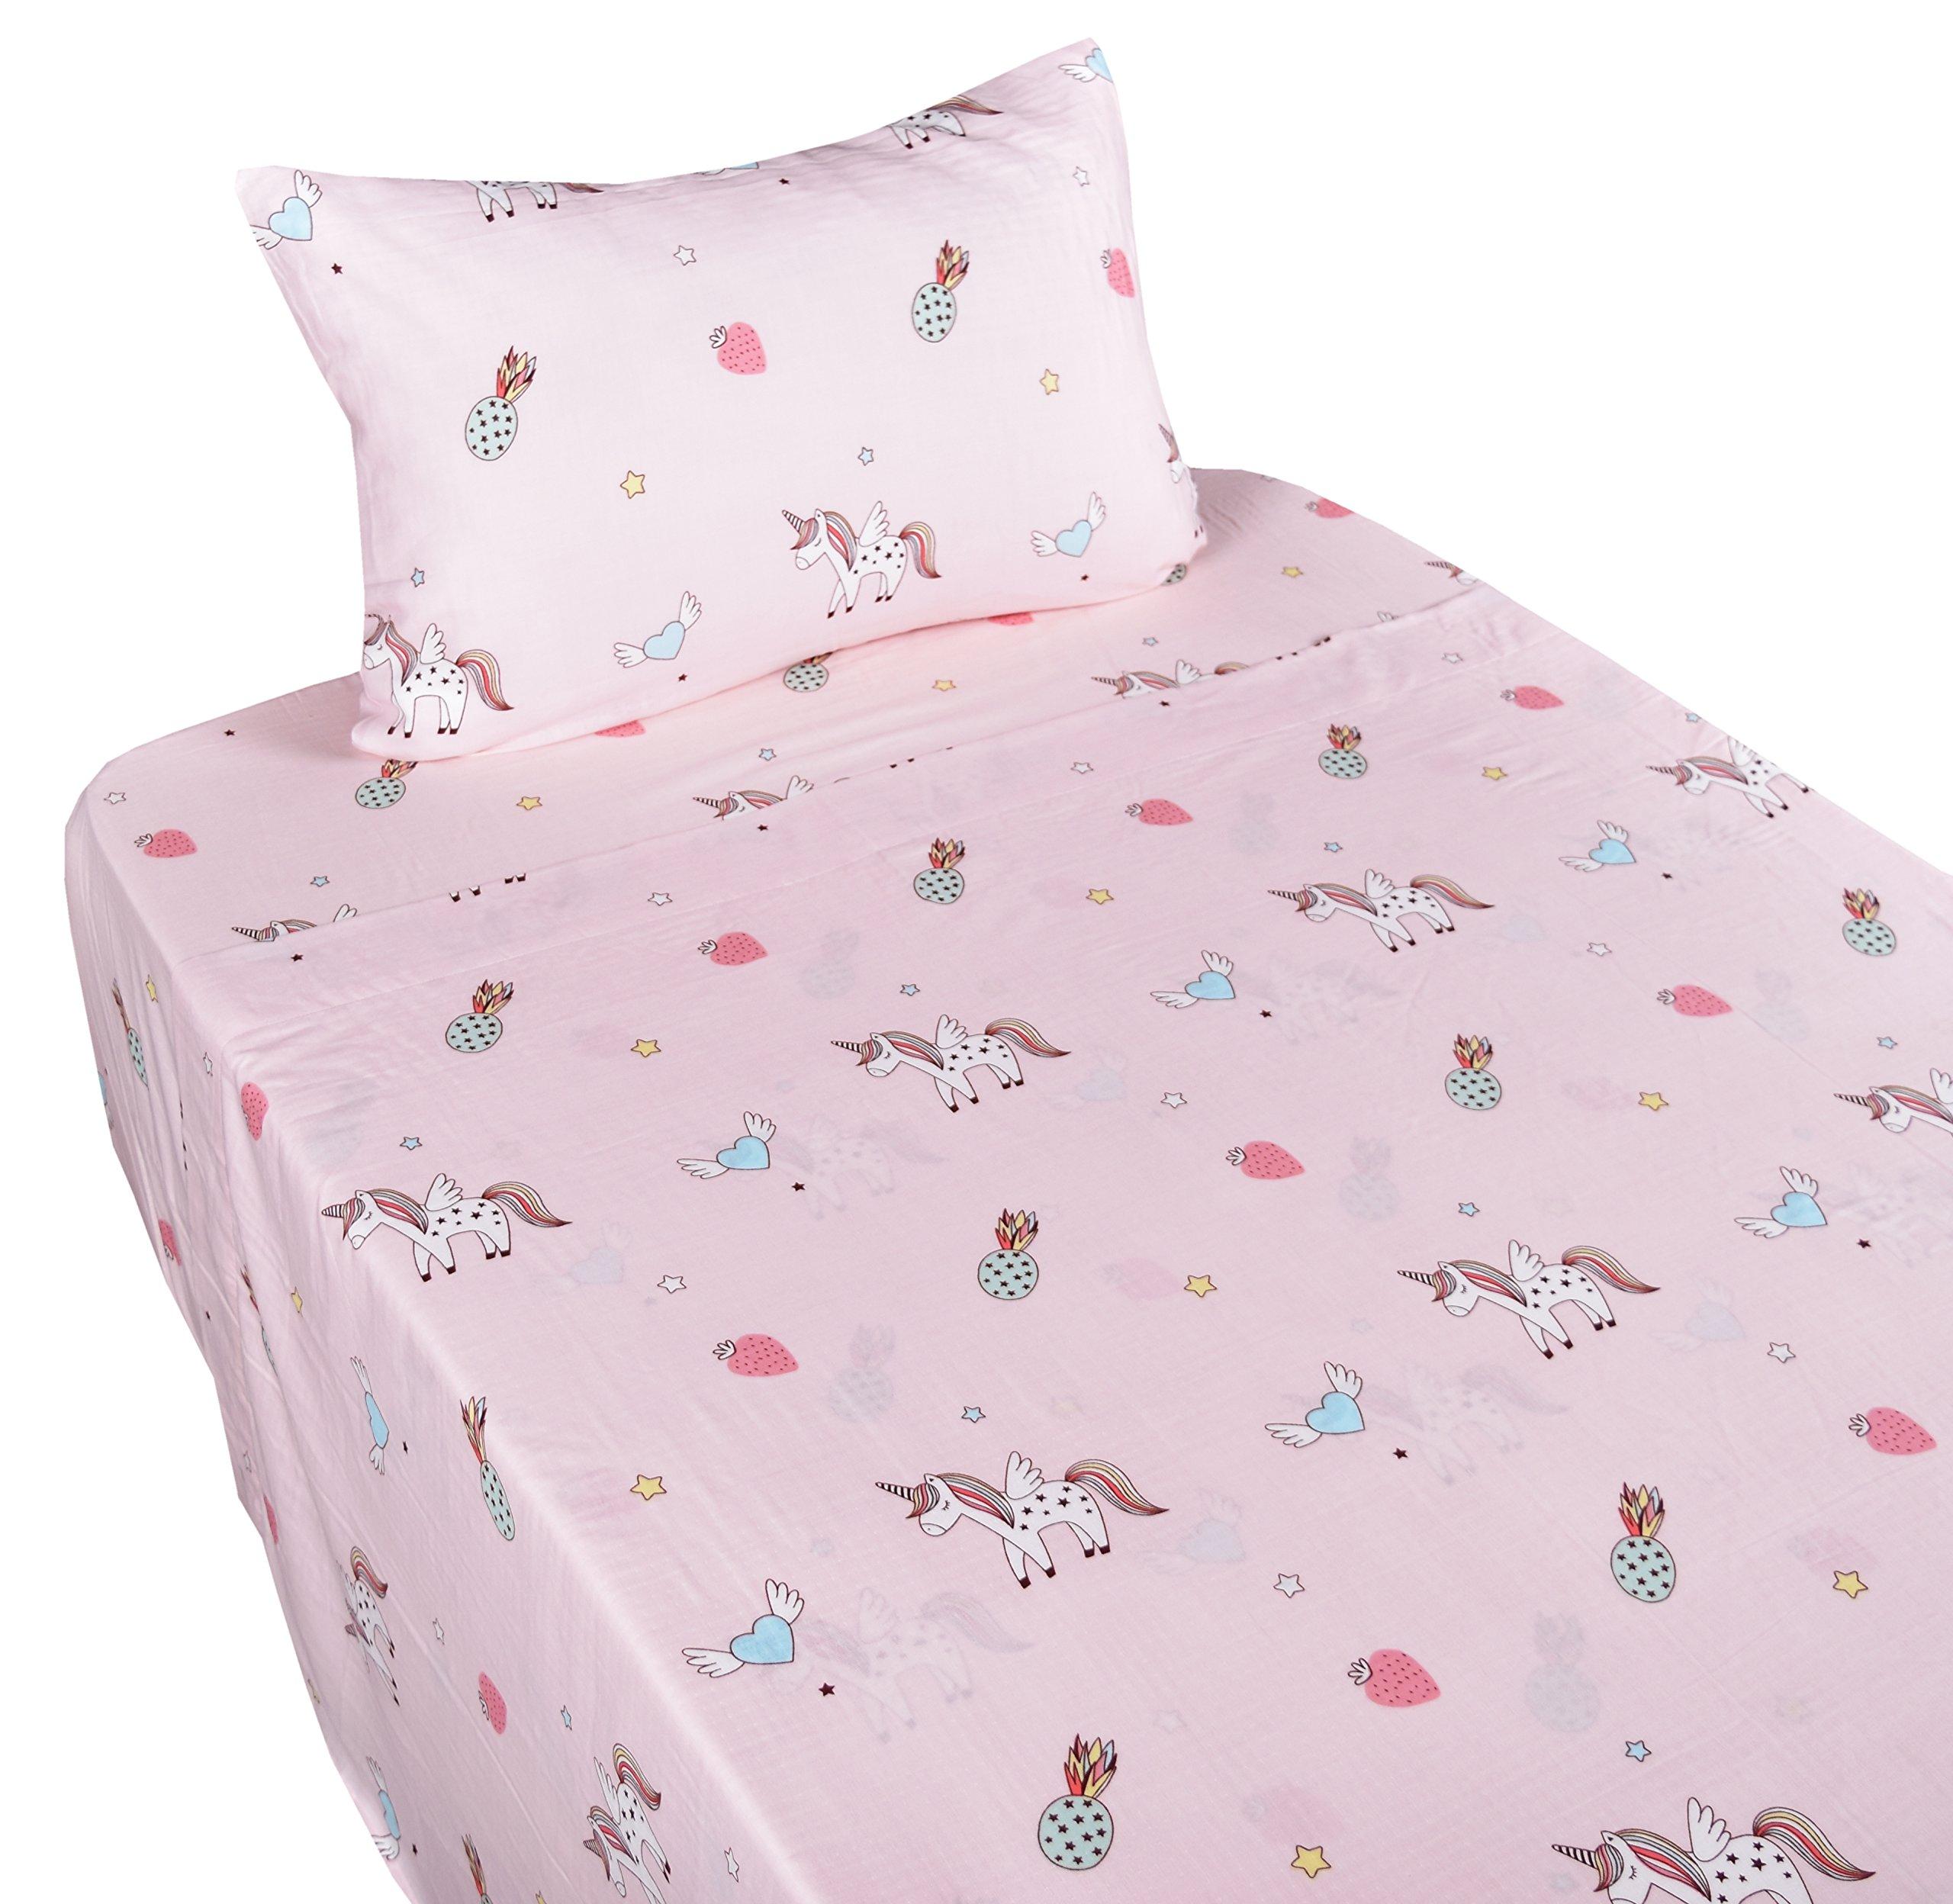 J-pinno Unicorn Happy Girls Pink Muslin Cotton Bed Sheet Set Twin, Flat Sheet & Fitted Sheet & Pillowcase Natural Hypoallergenic Bedding Set (16, Twin)